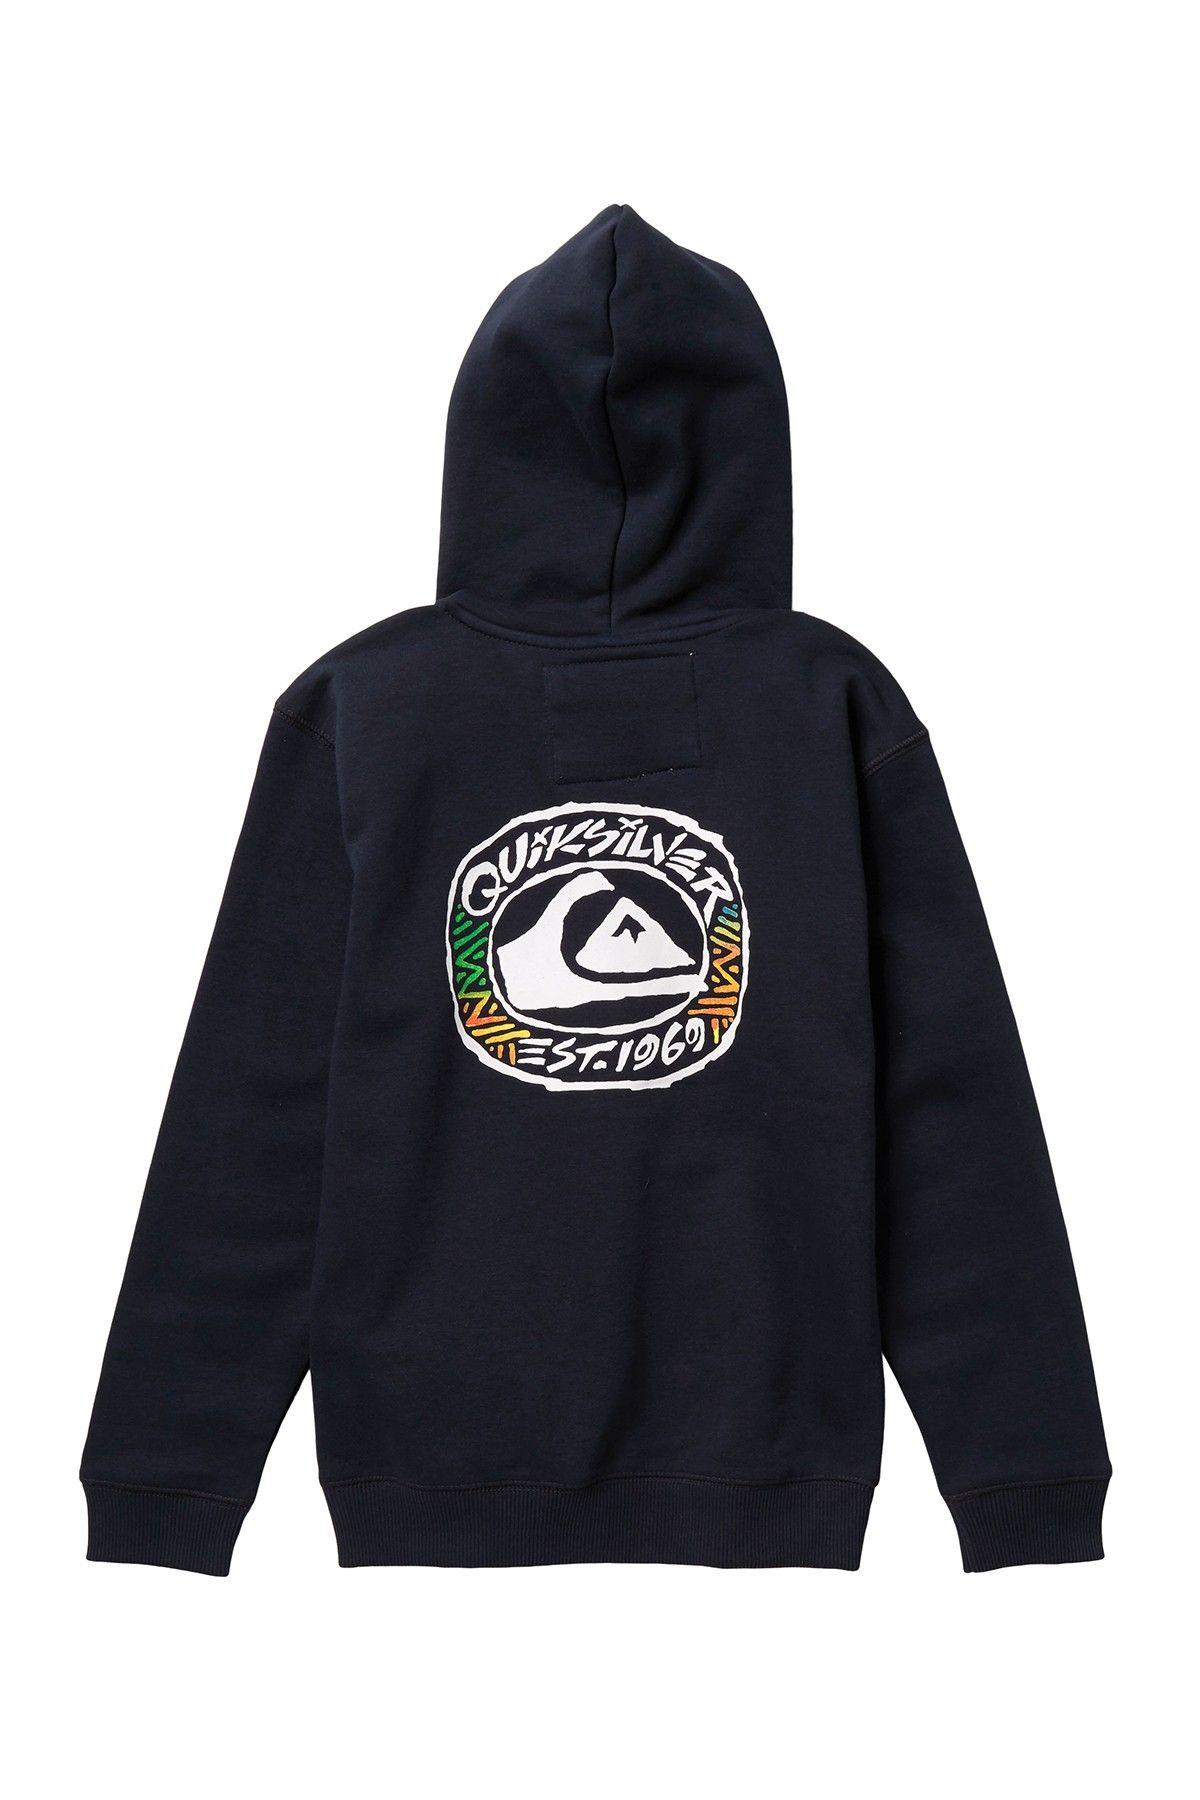 Quiksilver Boys Big Logo Hoodie